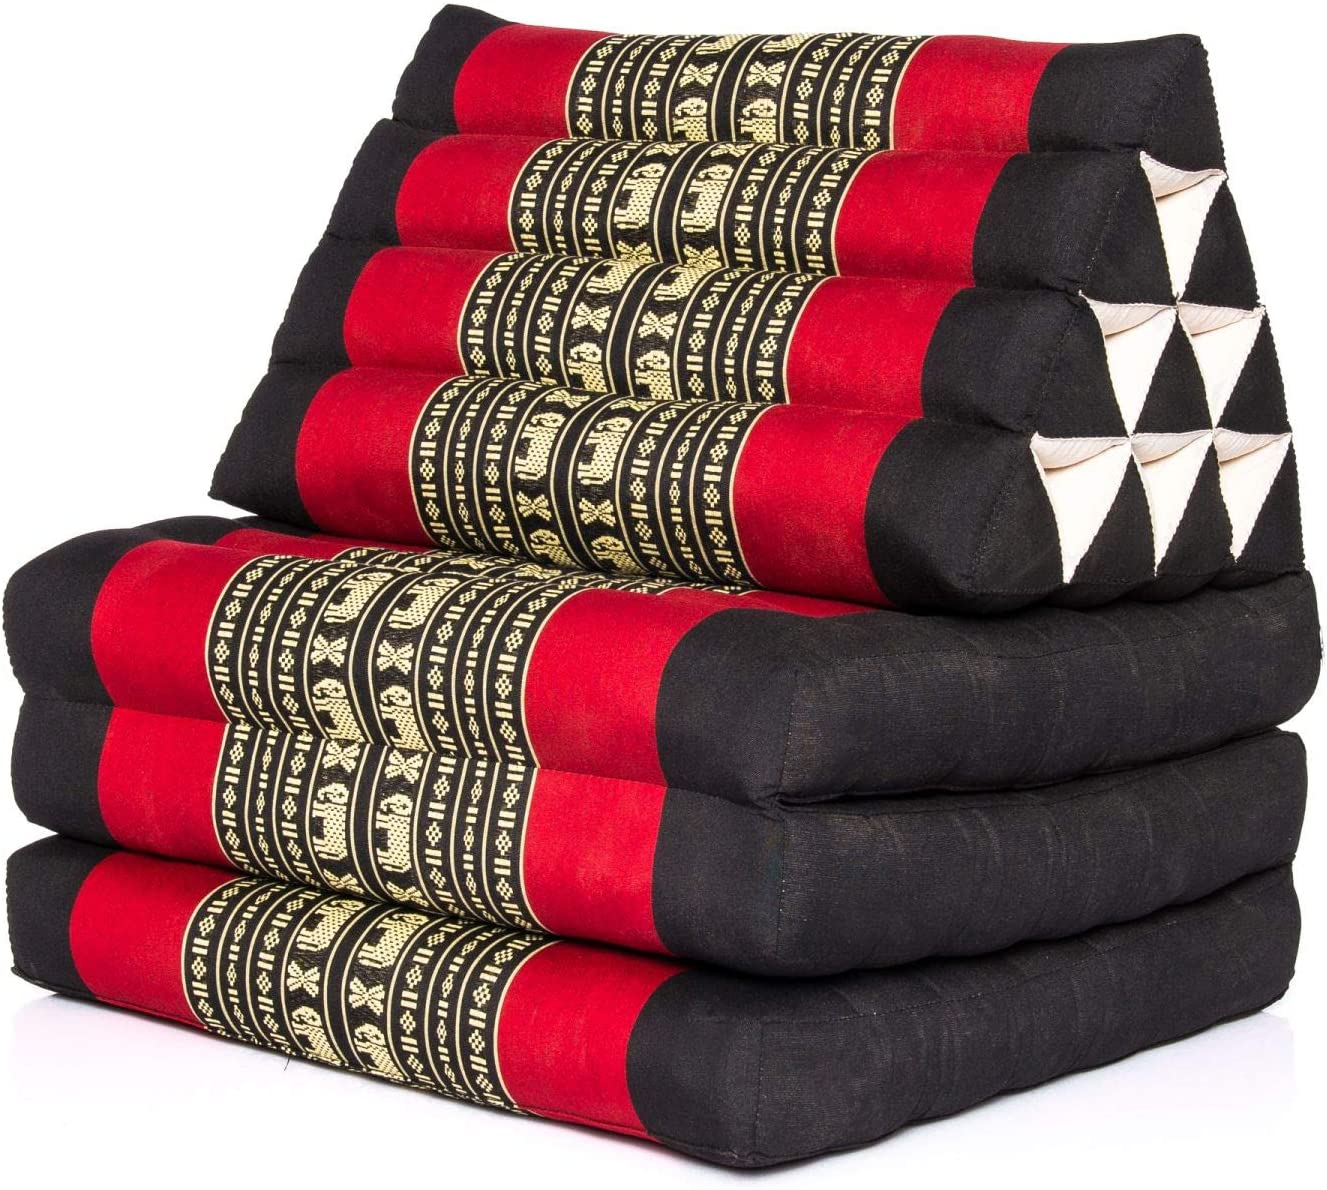 Kitama con 3 cojines como esterilla tailandesa Coj/ín tailand/és triangular relleno con kapok esterilla de yoga esterilla tailandesa